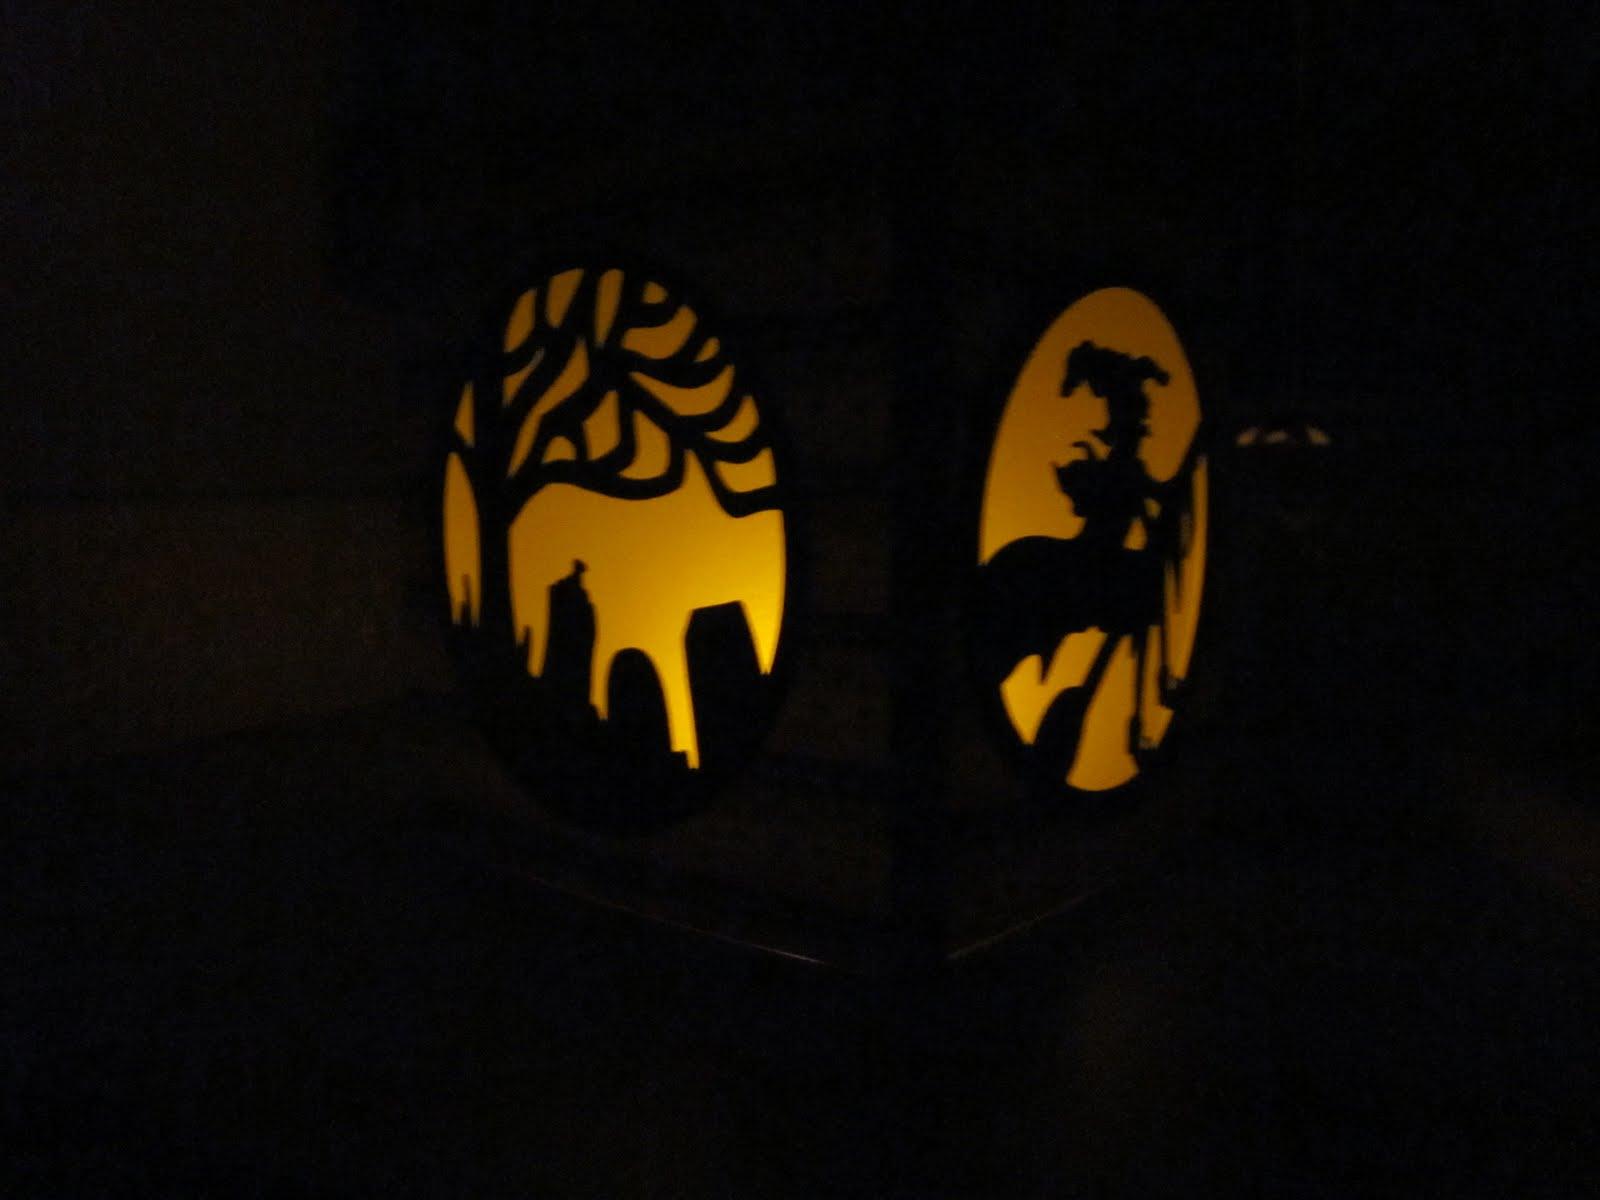 Paper scissors ink pumpkin carving lanterns with